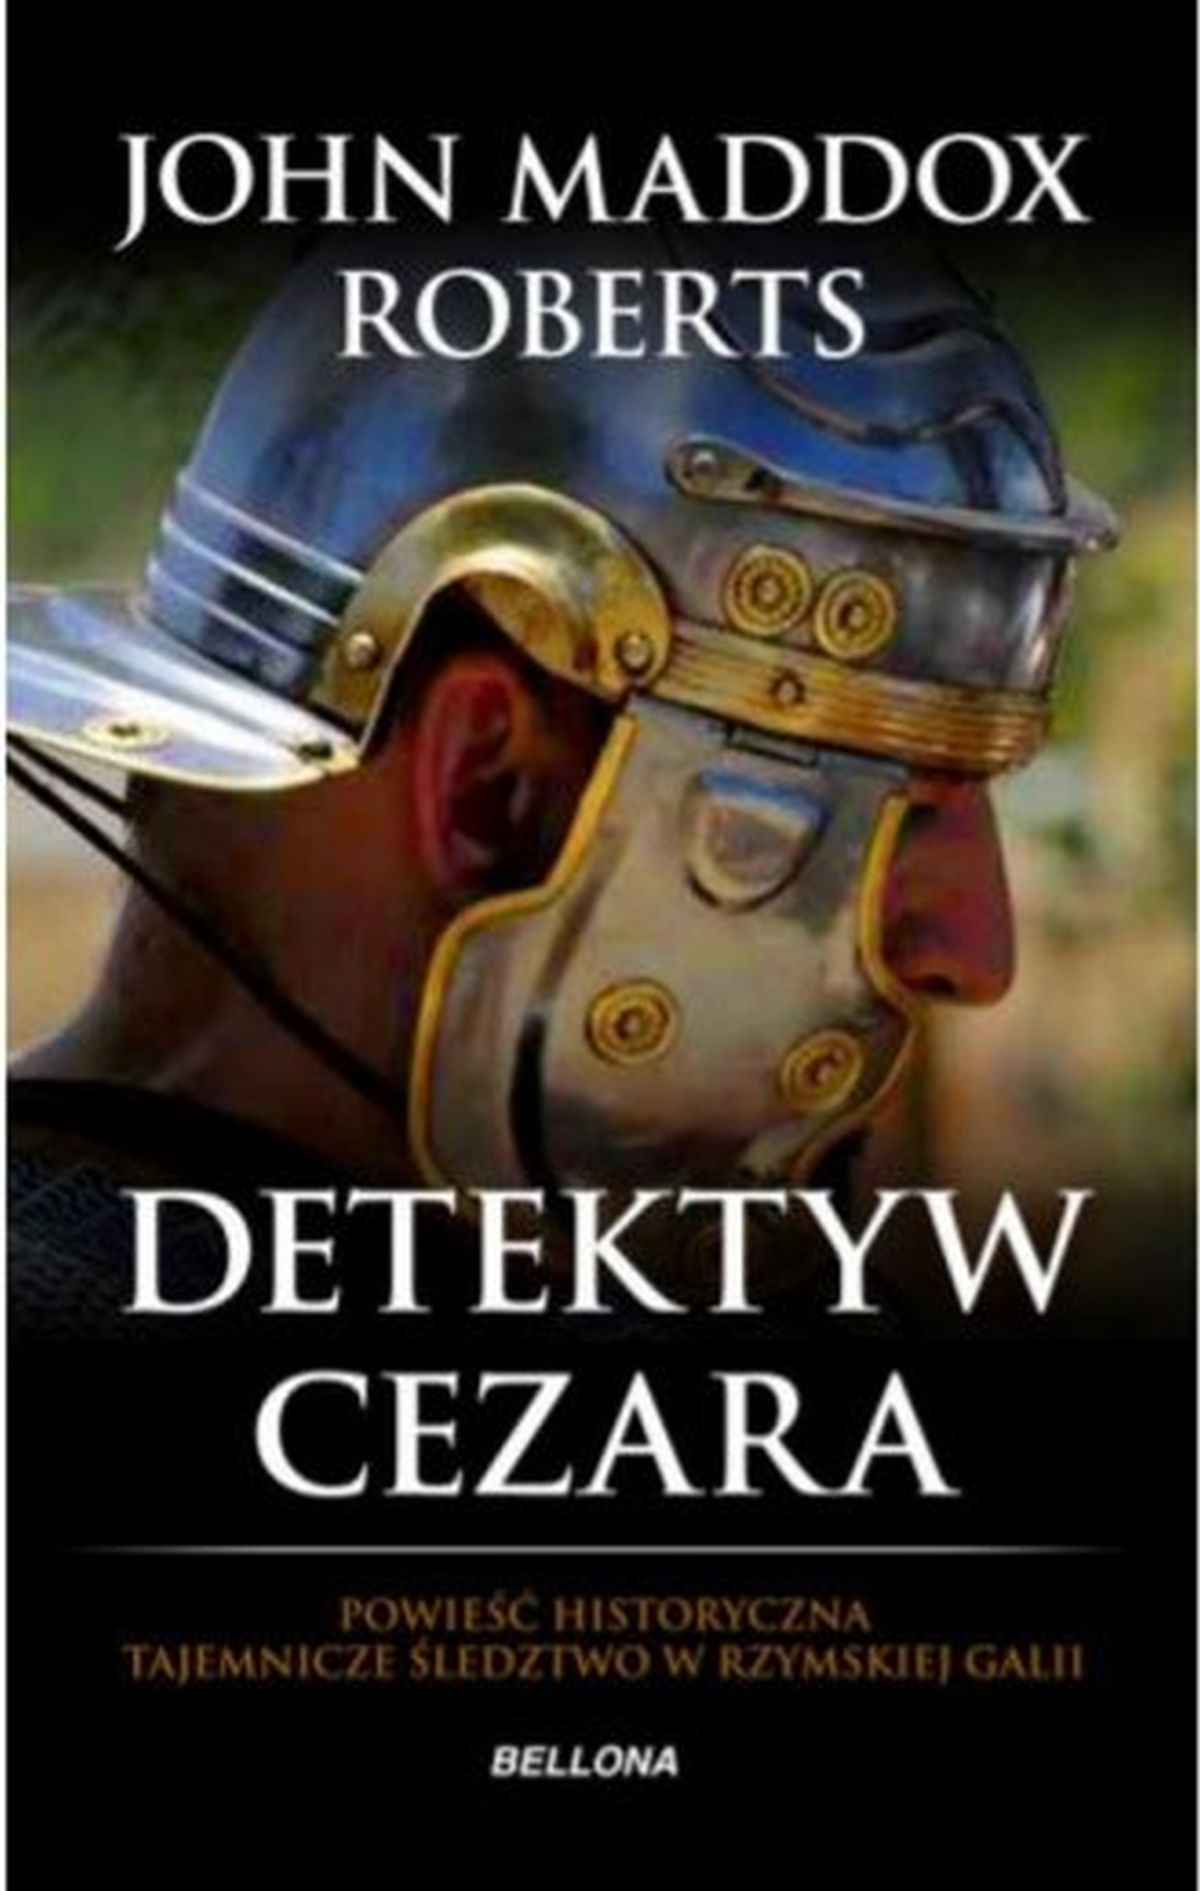 Detektyw Cezara